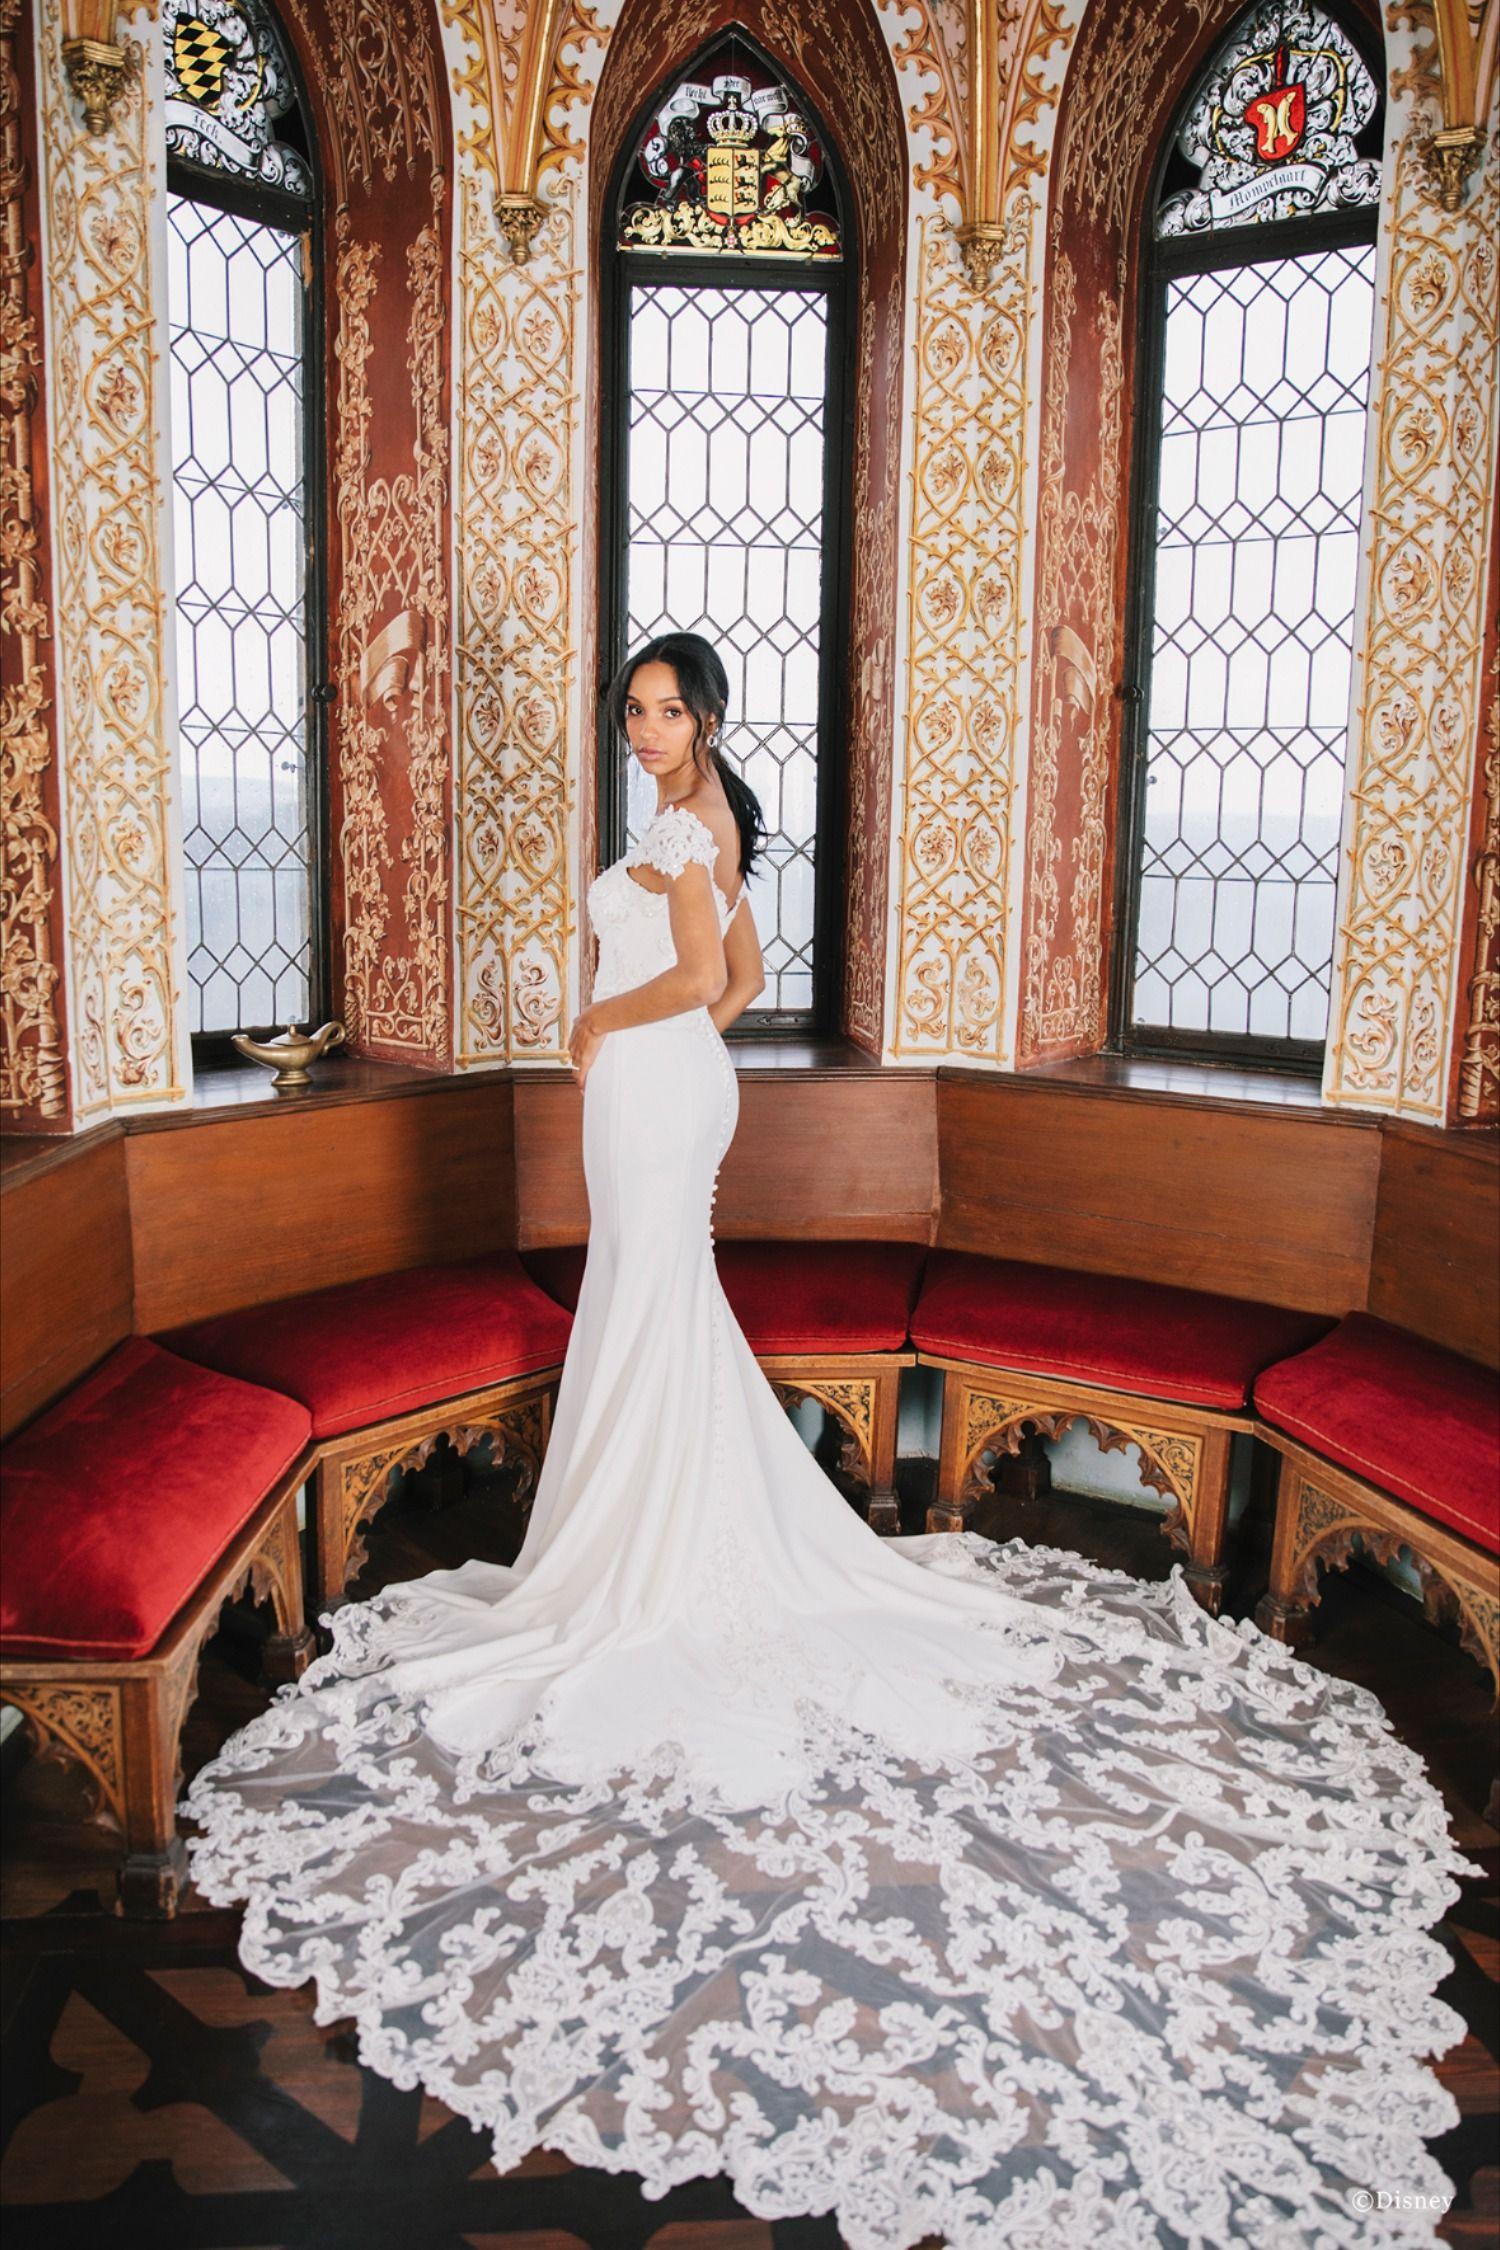 The Jasmine Wedding Gowns The Bridal Collection Disney Princess Wedding Dresses Disney Wedding Dresses Princess Wedding Dresses [ 2250 x 1500 Pixel ]